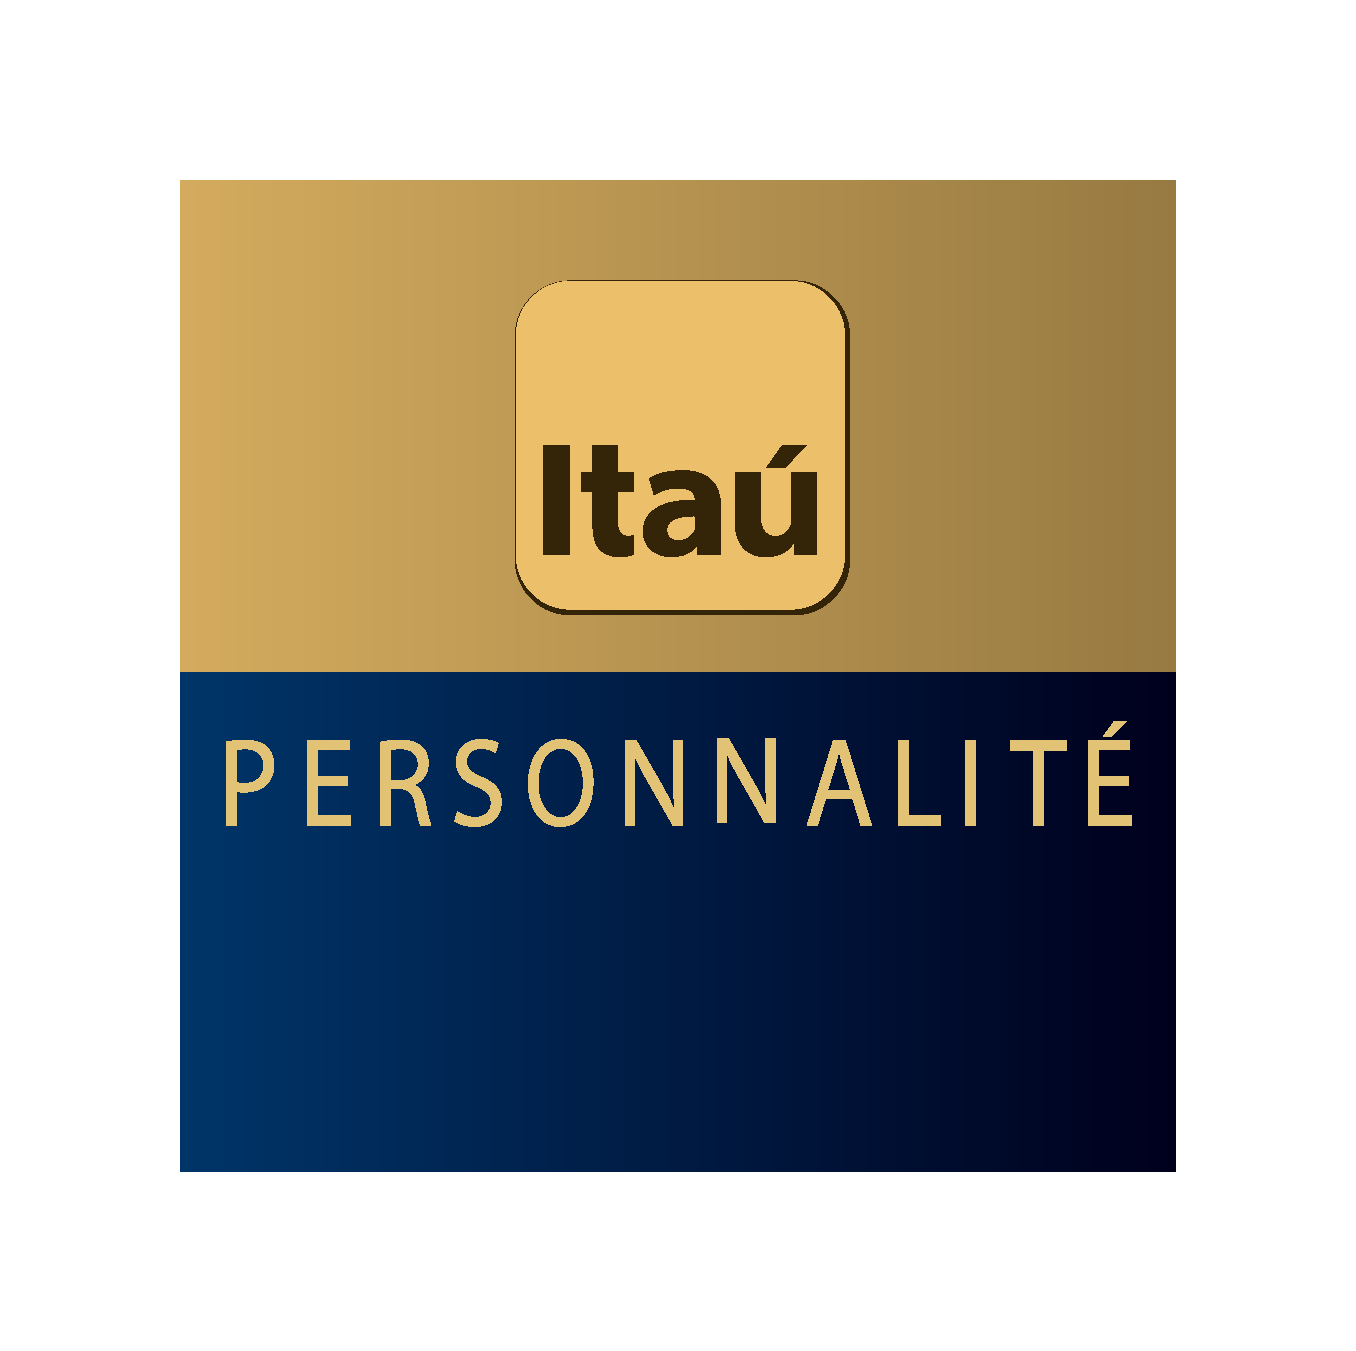 Logo_Itau Personnalite2.png